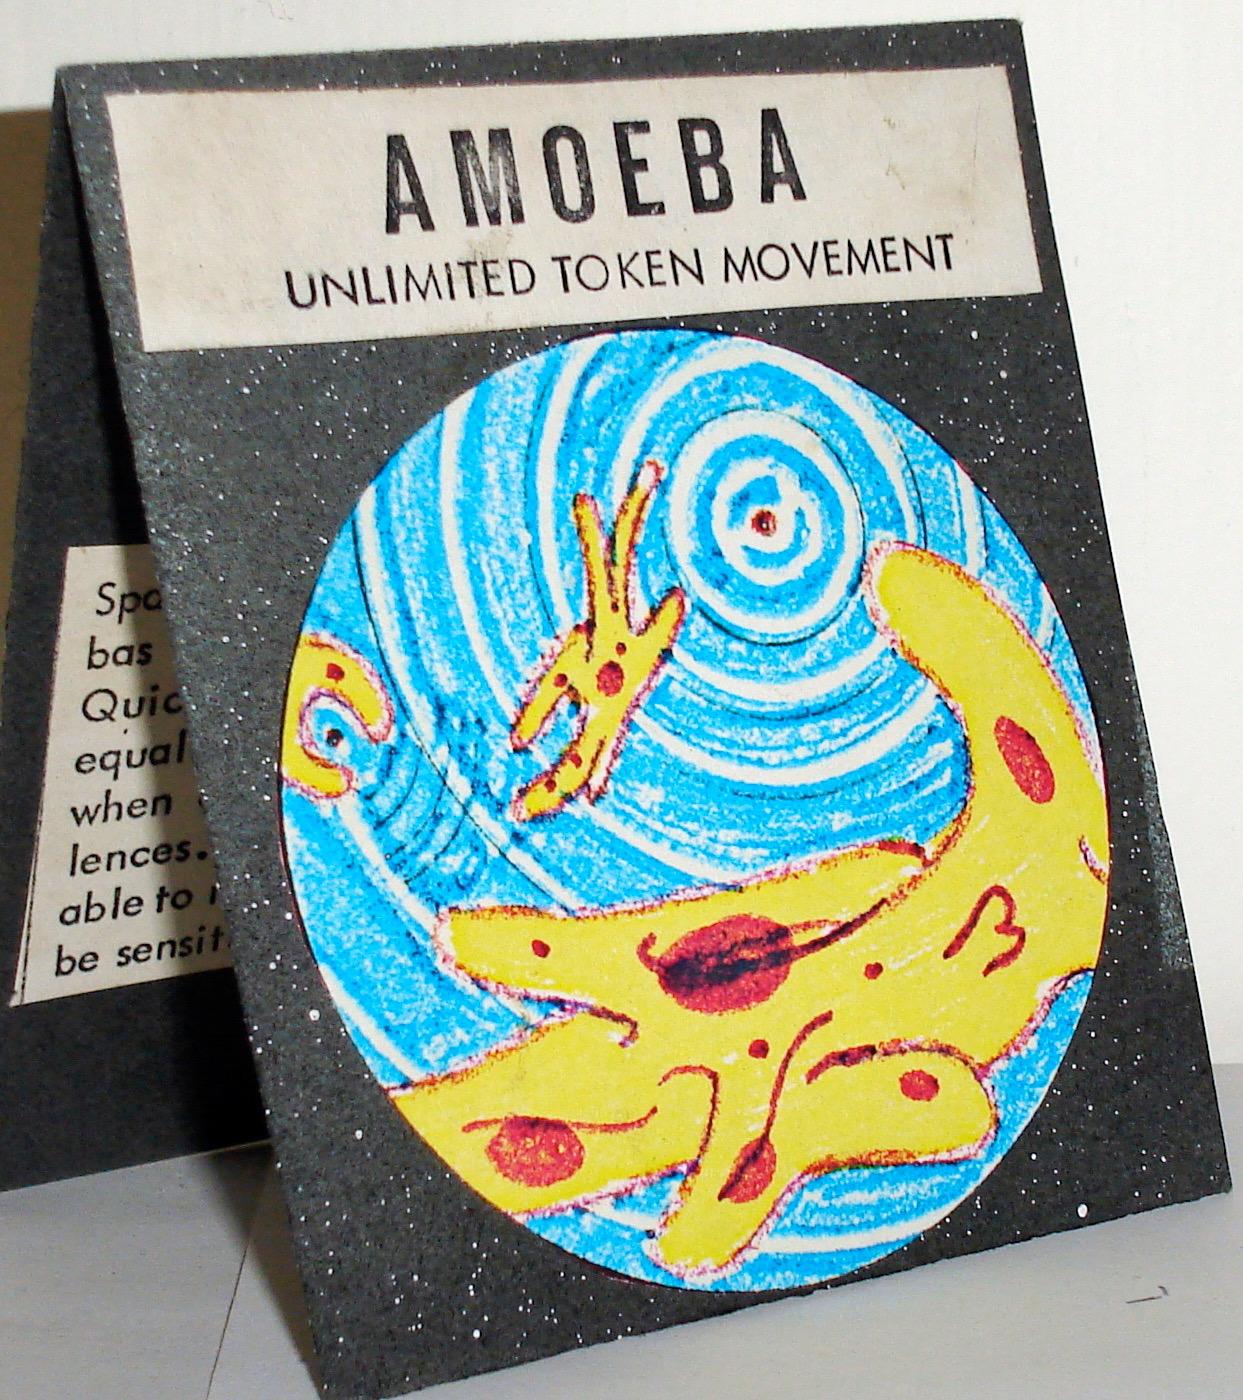 ce-old-amoeba.jpg